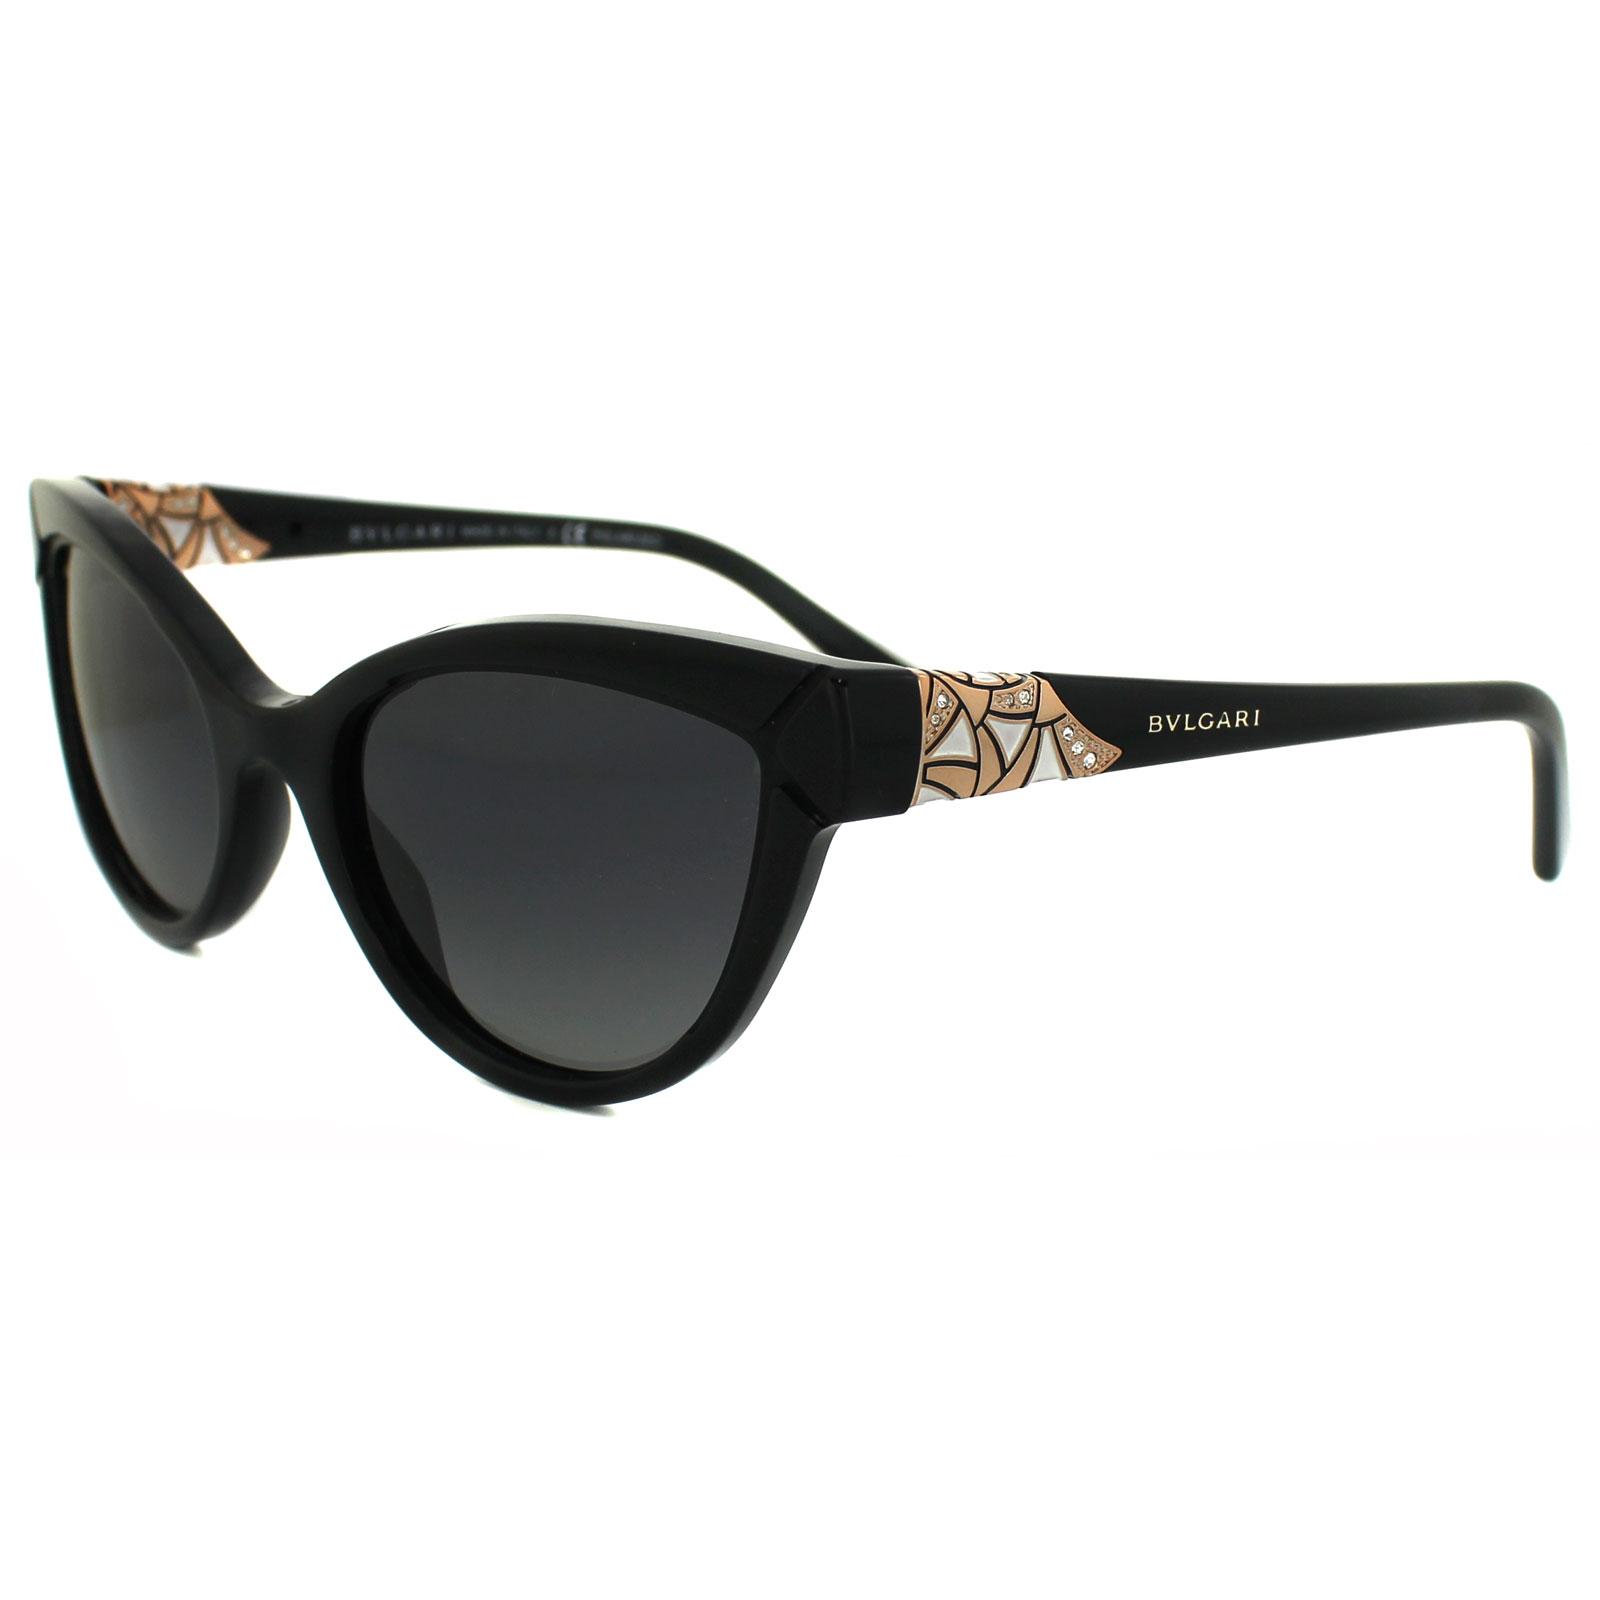 edc8a2b91b Sentinel Bvlgari Sunglasses 8156B 501 T3 Black Grey Gradient Polarized